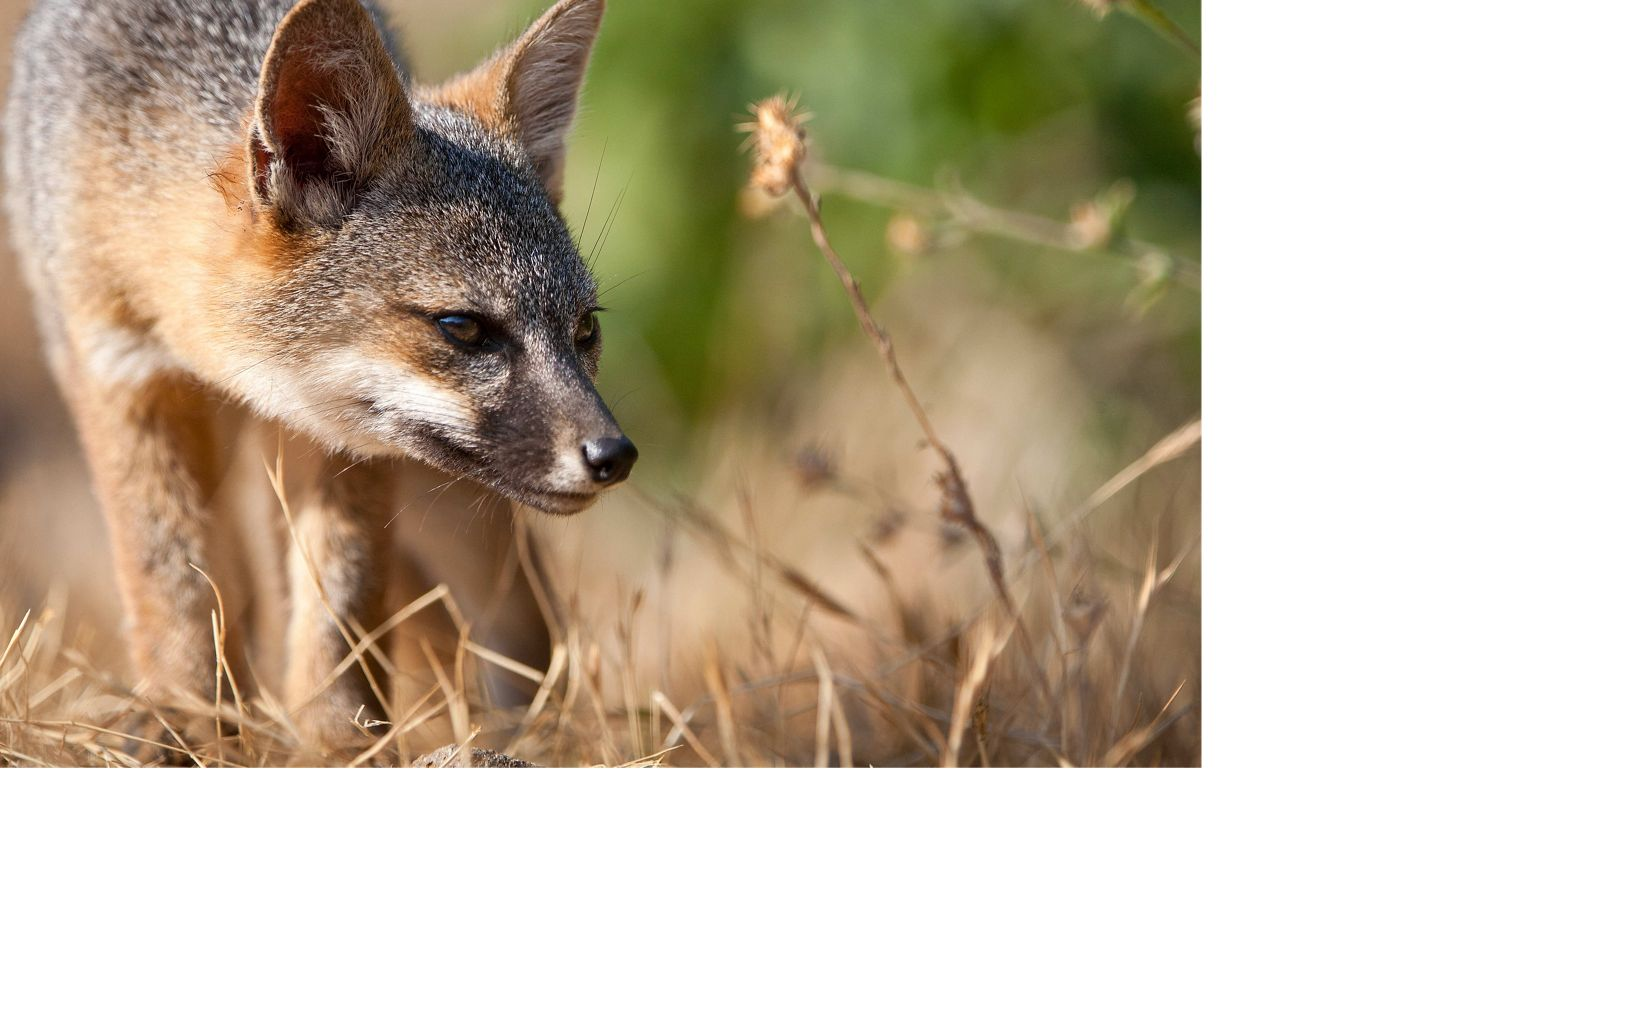 Santa Cruz Island foxes faced bleak odds 16 years ago